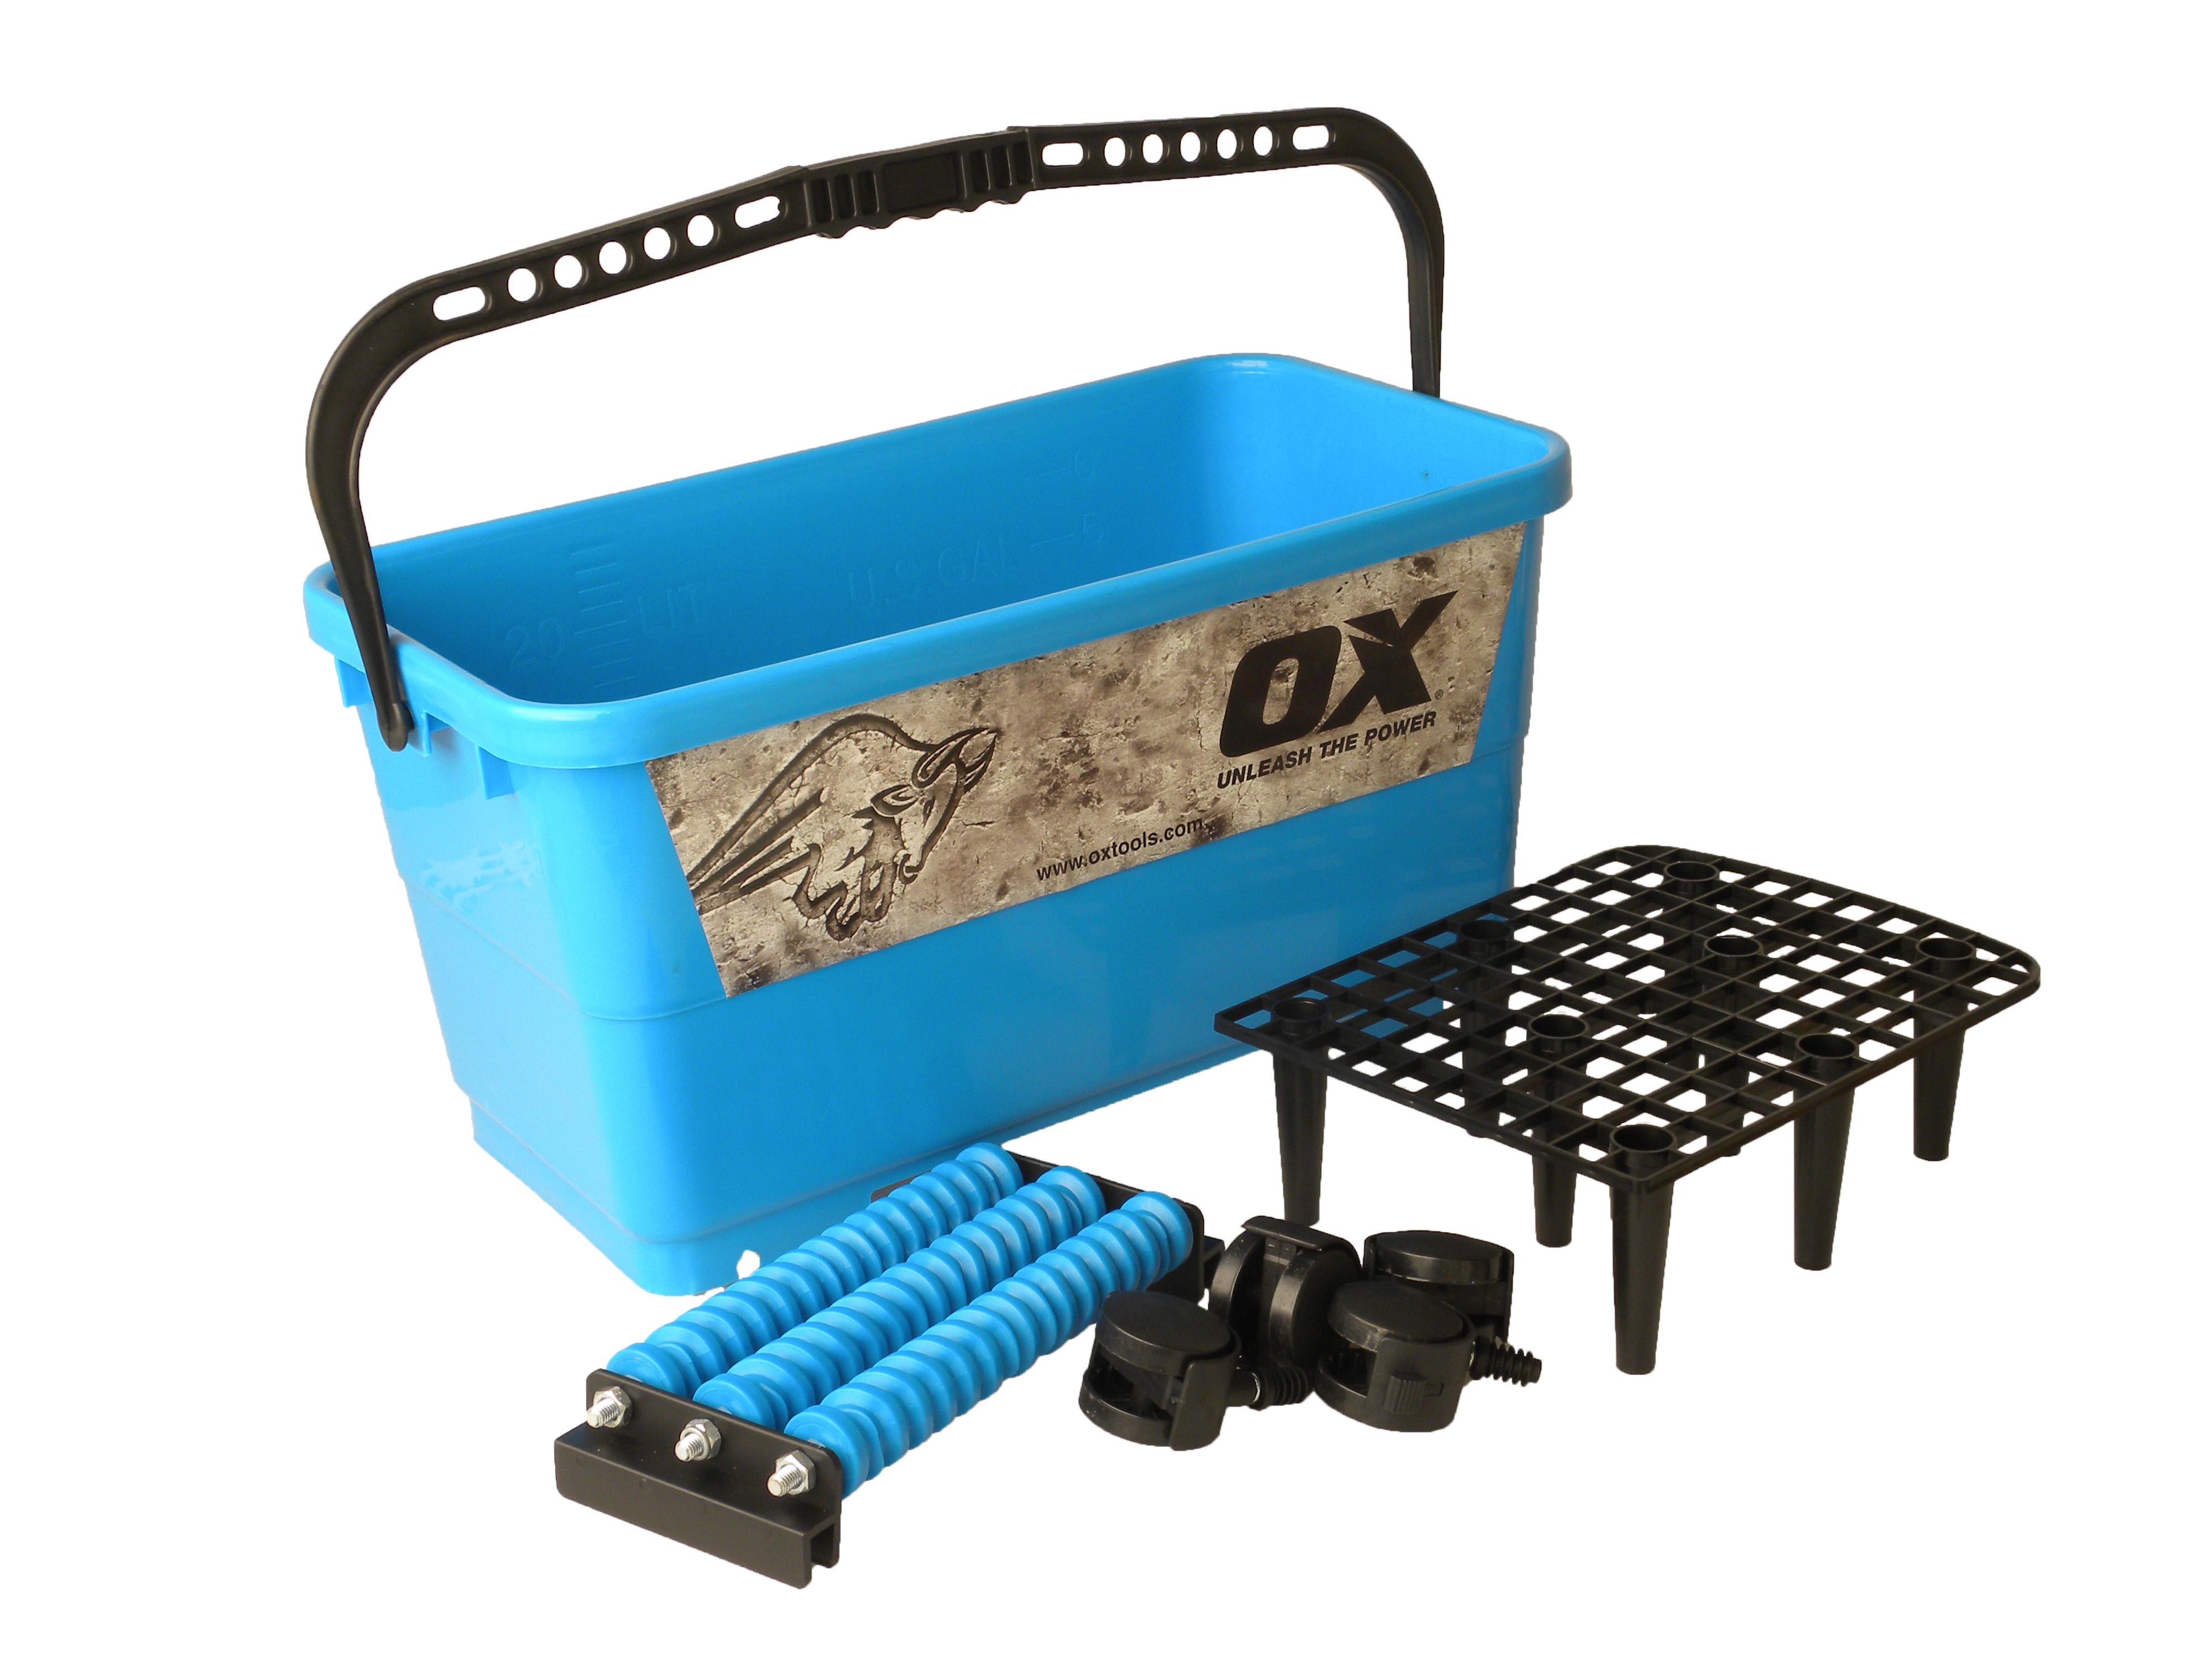 Ox schoonmaakbassin